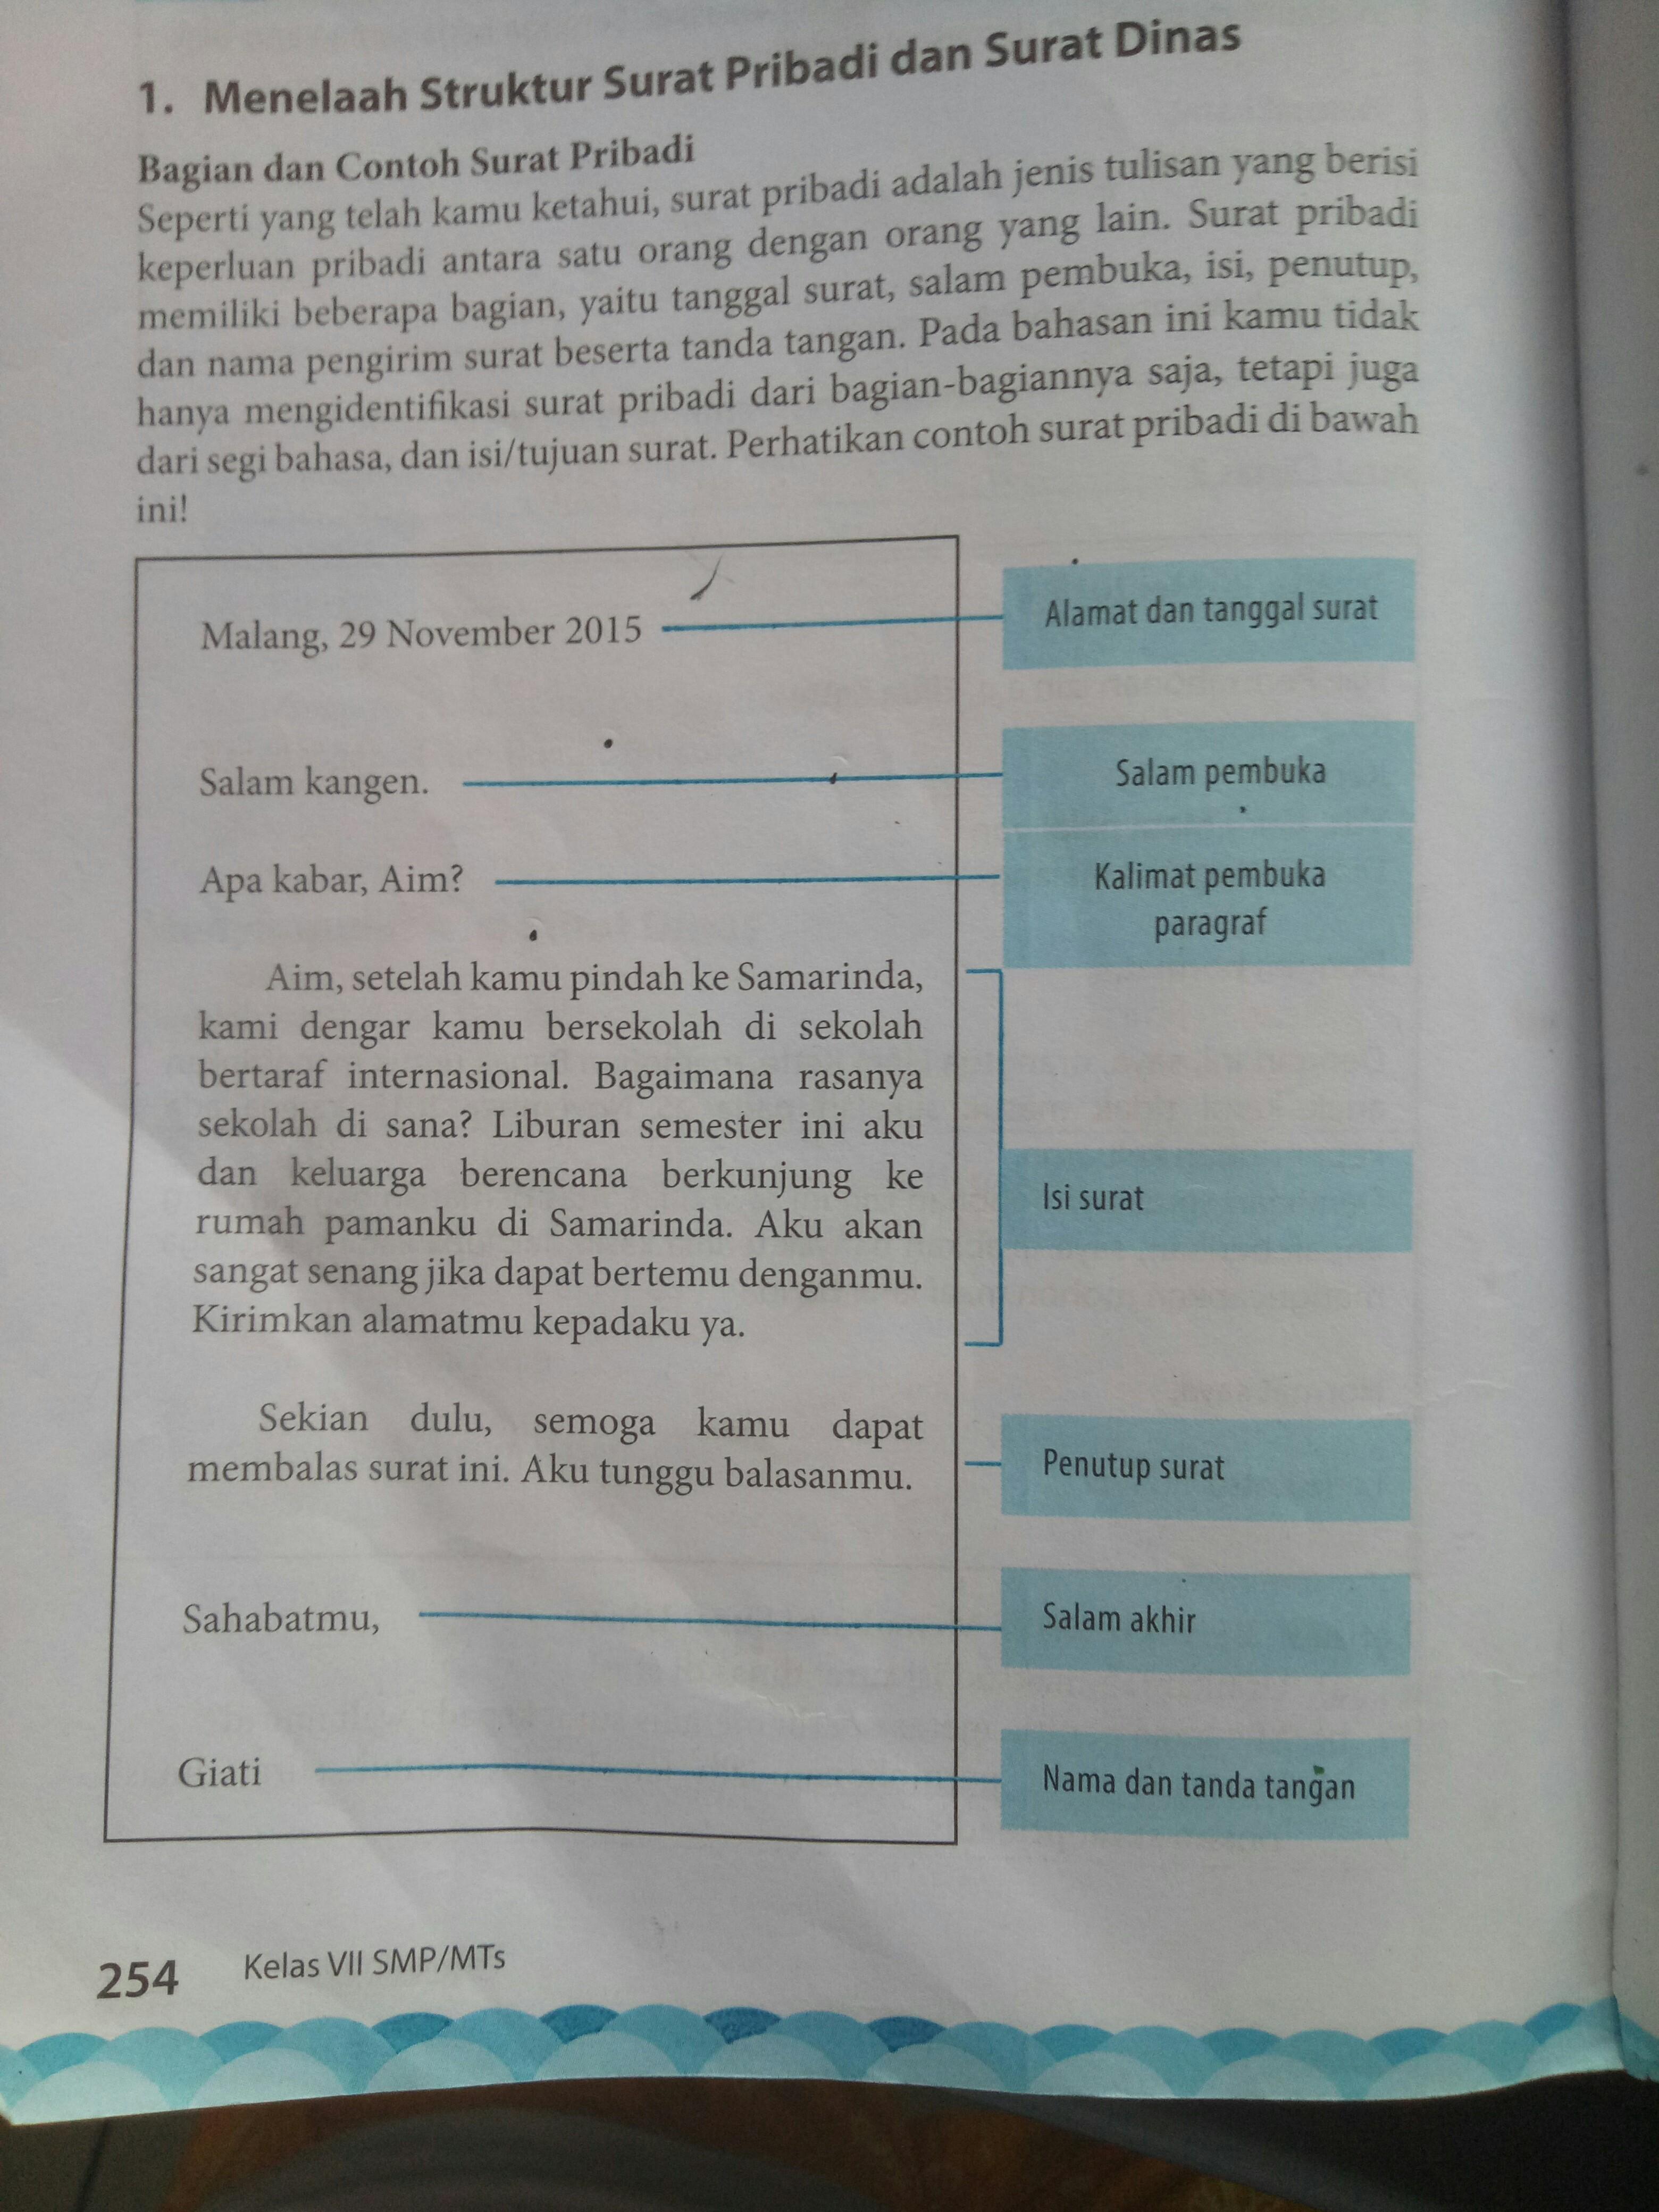 Contoh unsur Surat pribadi Dan Surat dinas - Brainly.co.id